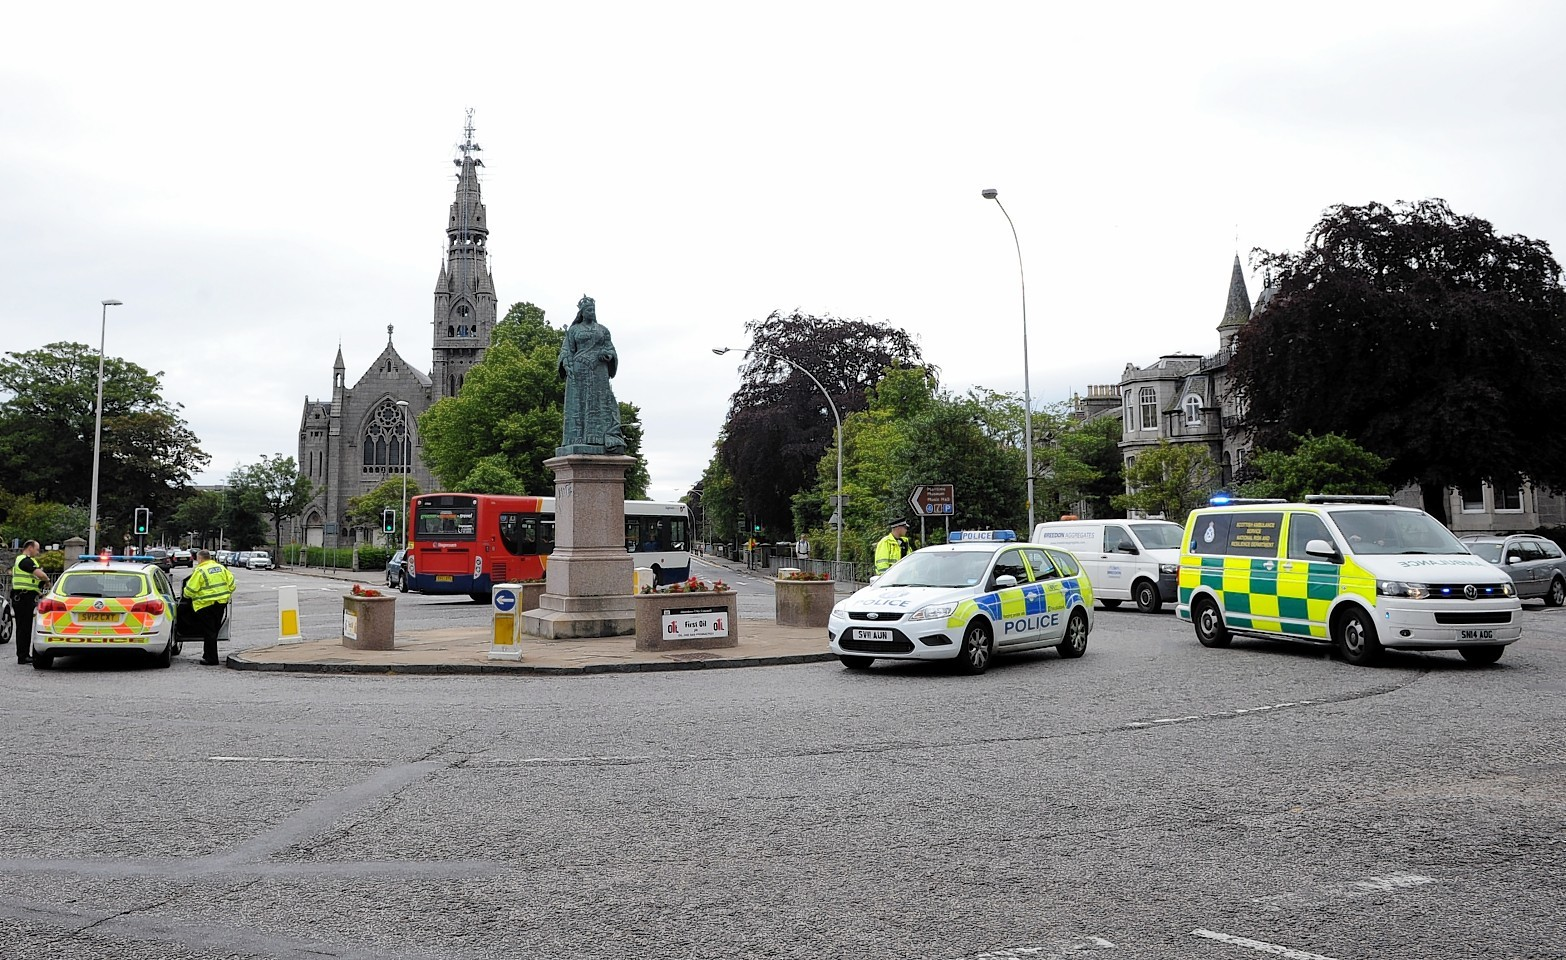 The scene of the incident at Queen's Cross, Aberdeen